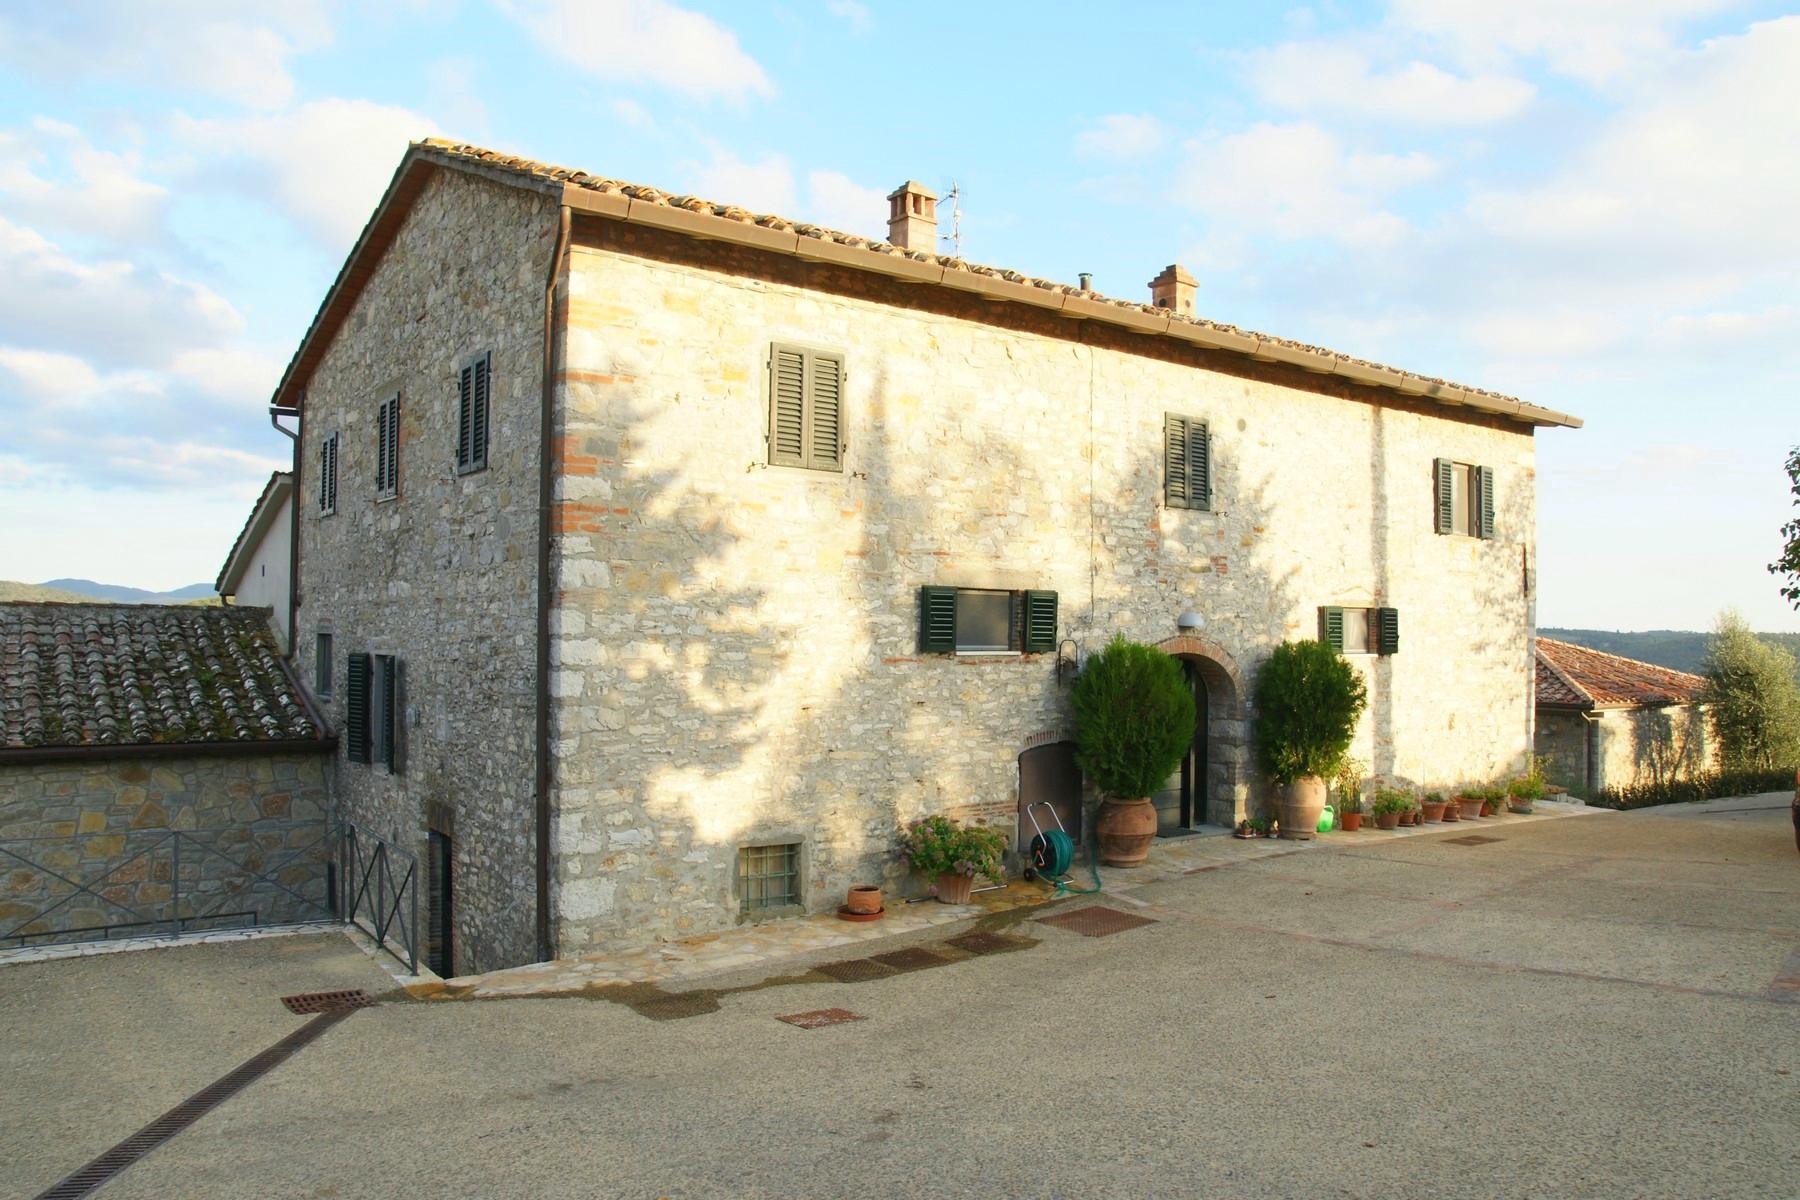 Rustico in Vendita a Radda In Chianti: 5 locali, 1380 mq - Foto 5